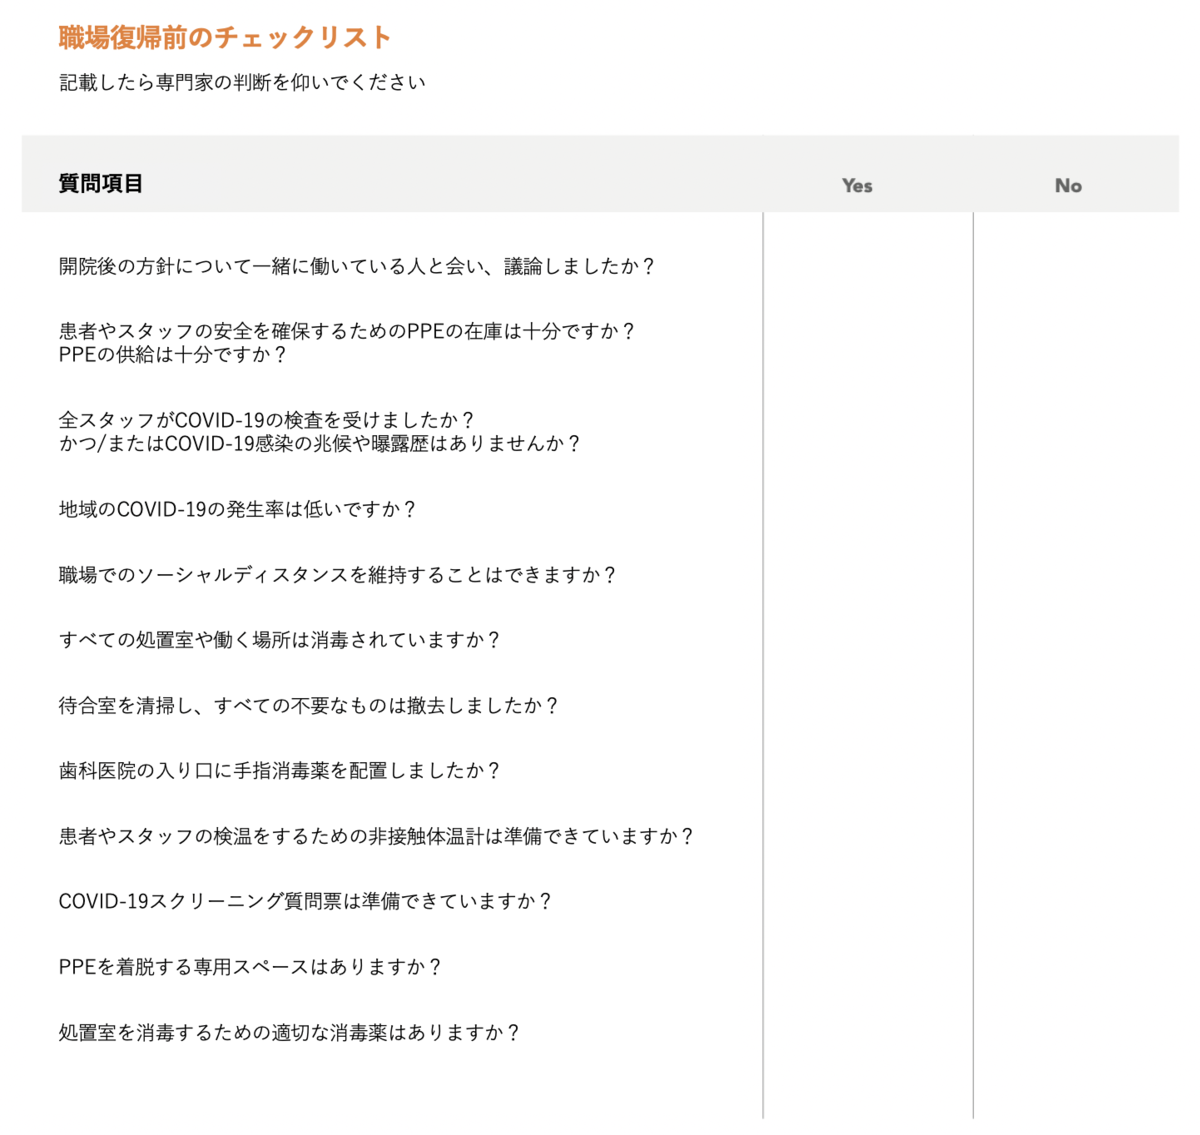 f:id:masaomikono:20200507102014p:plain